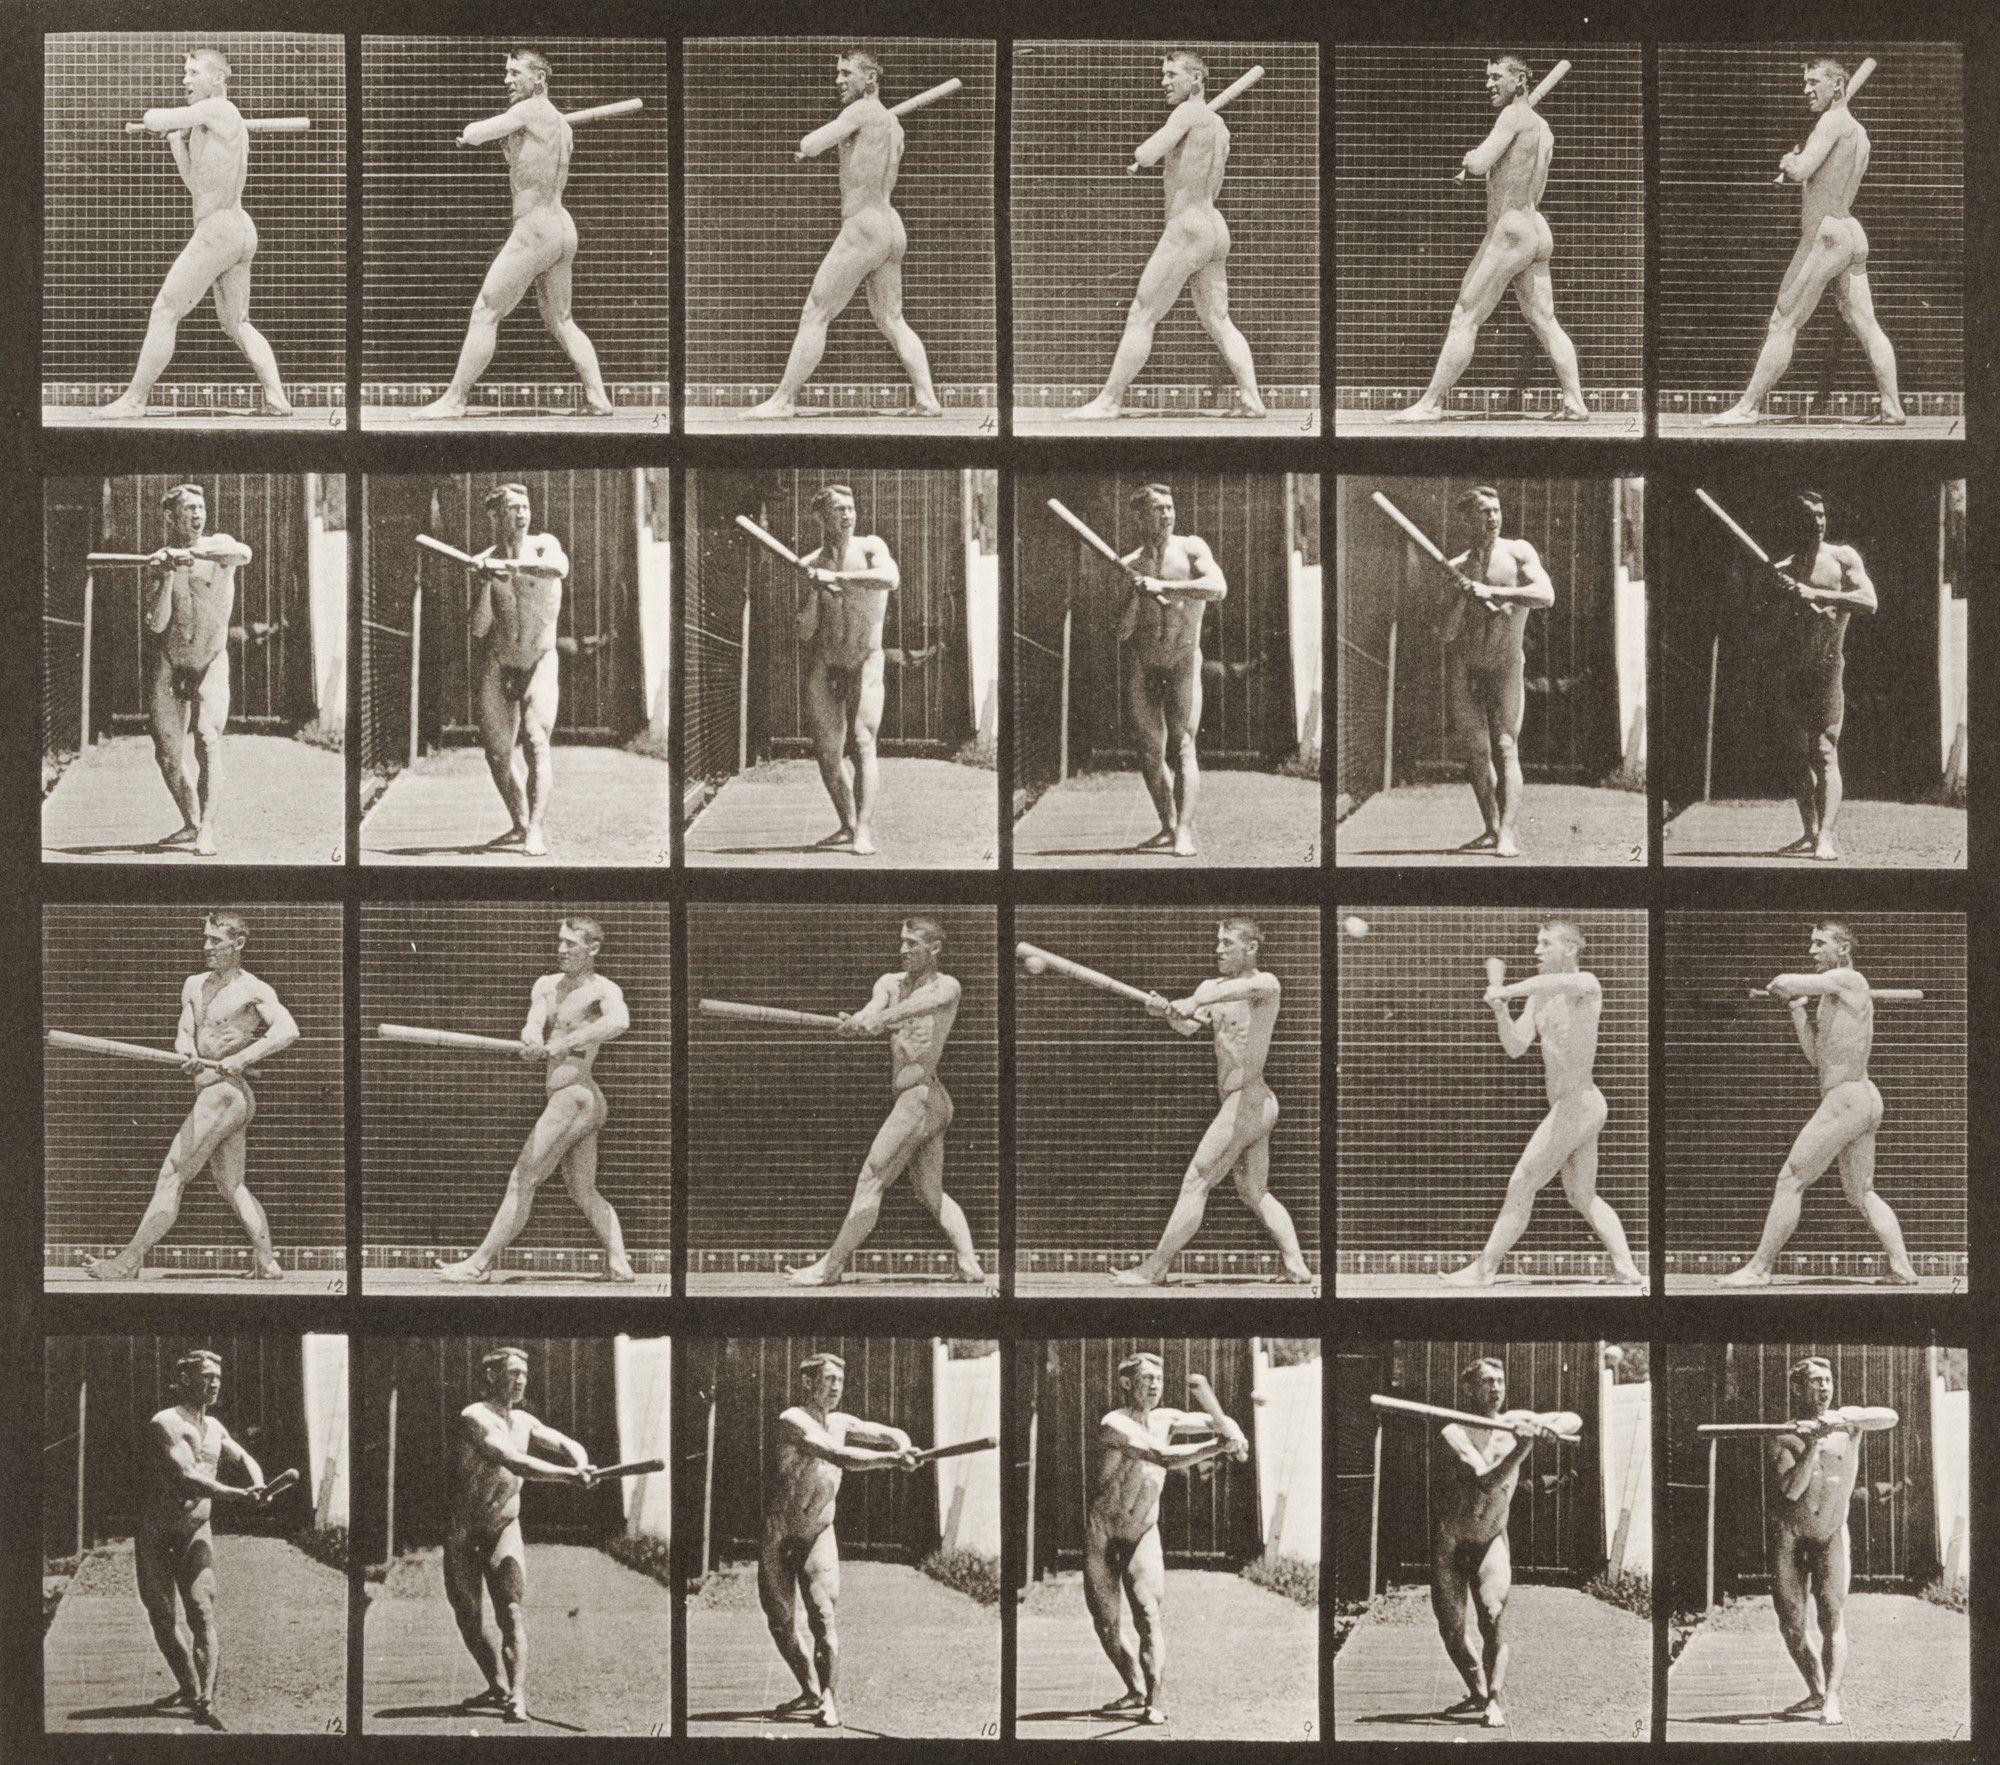 Nude Man Playing Baseball, Batting Animal Locomotion -3495